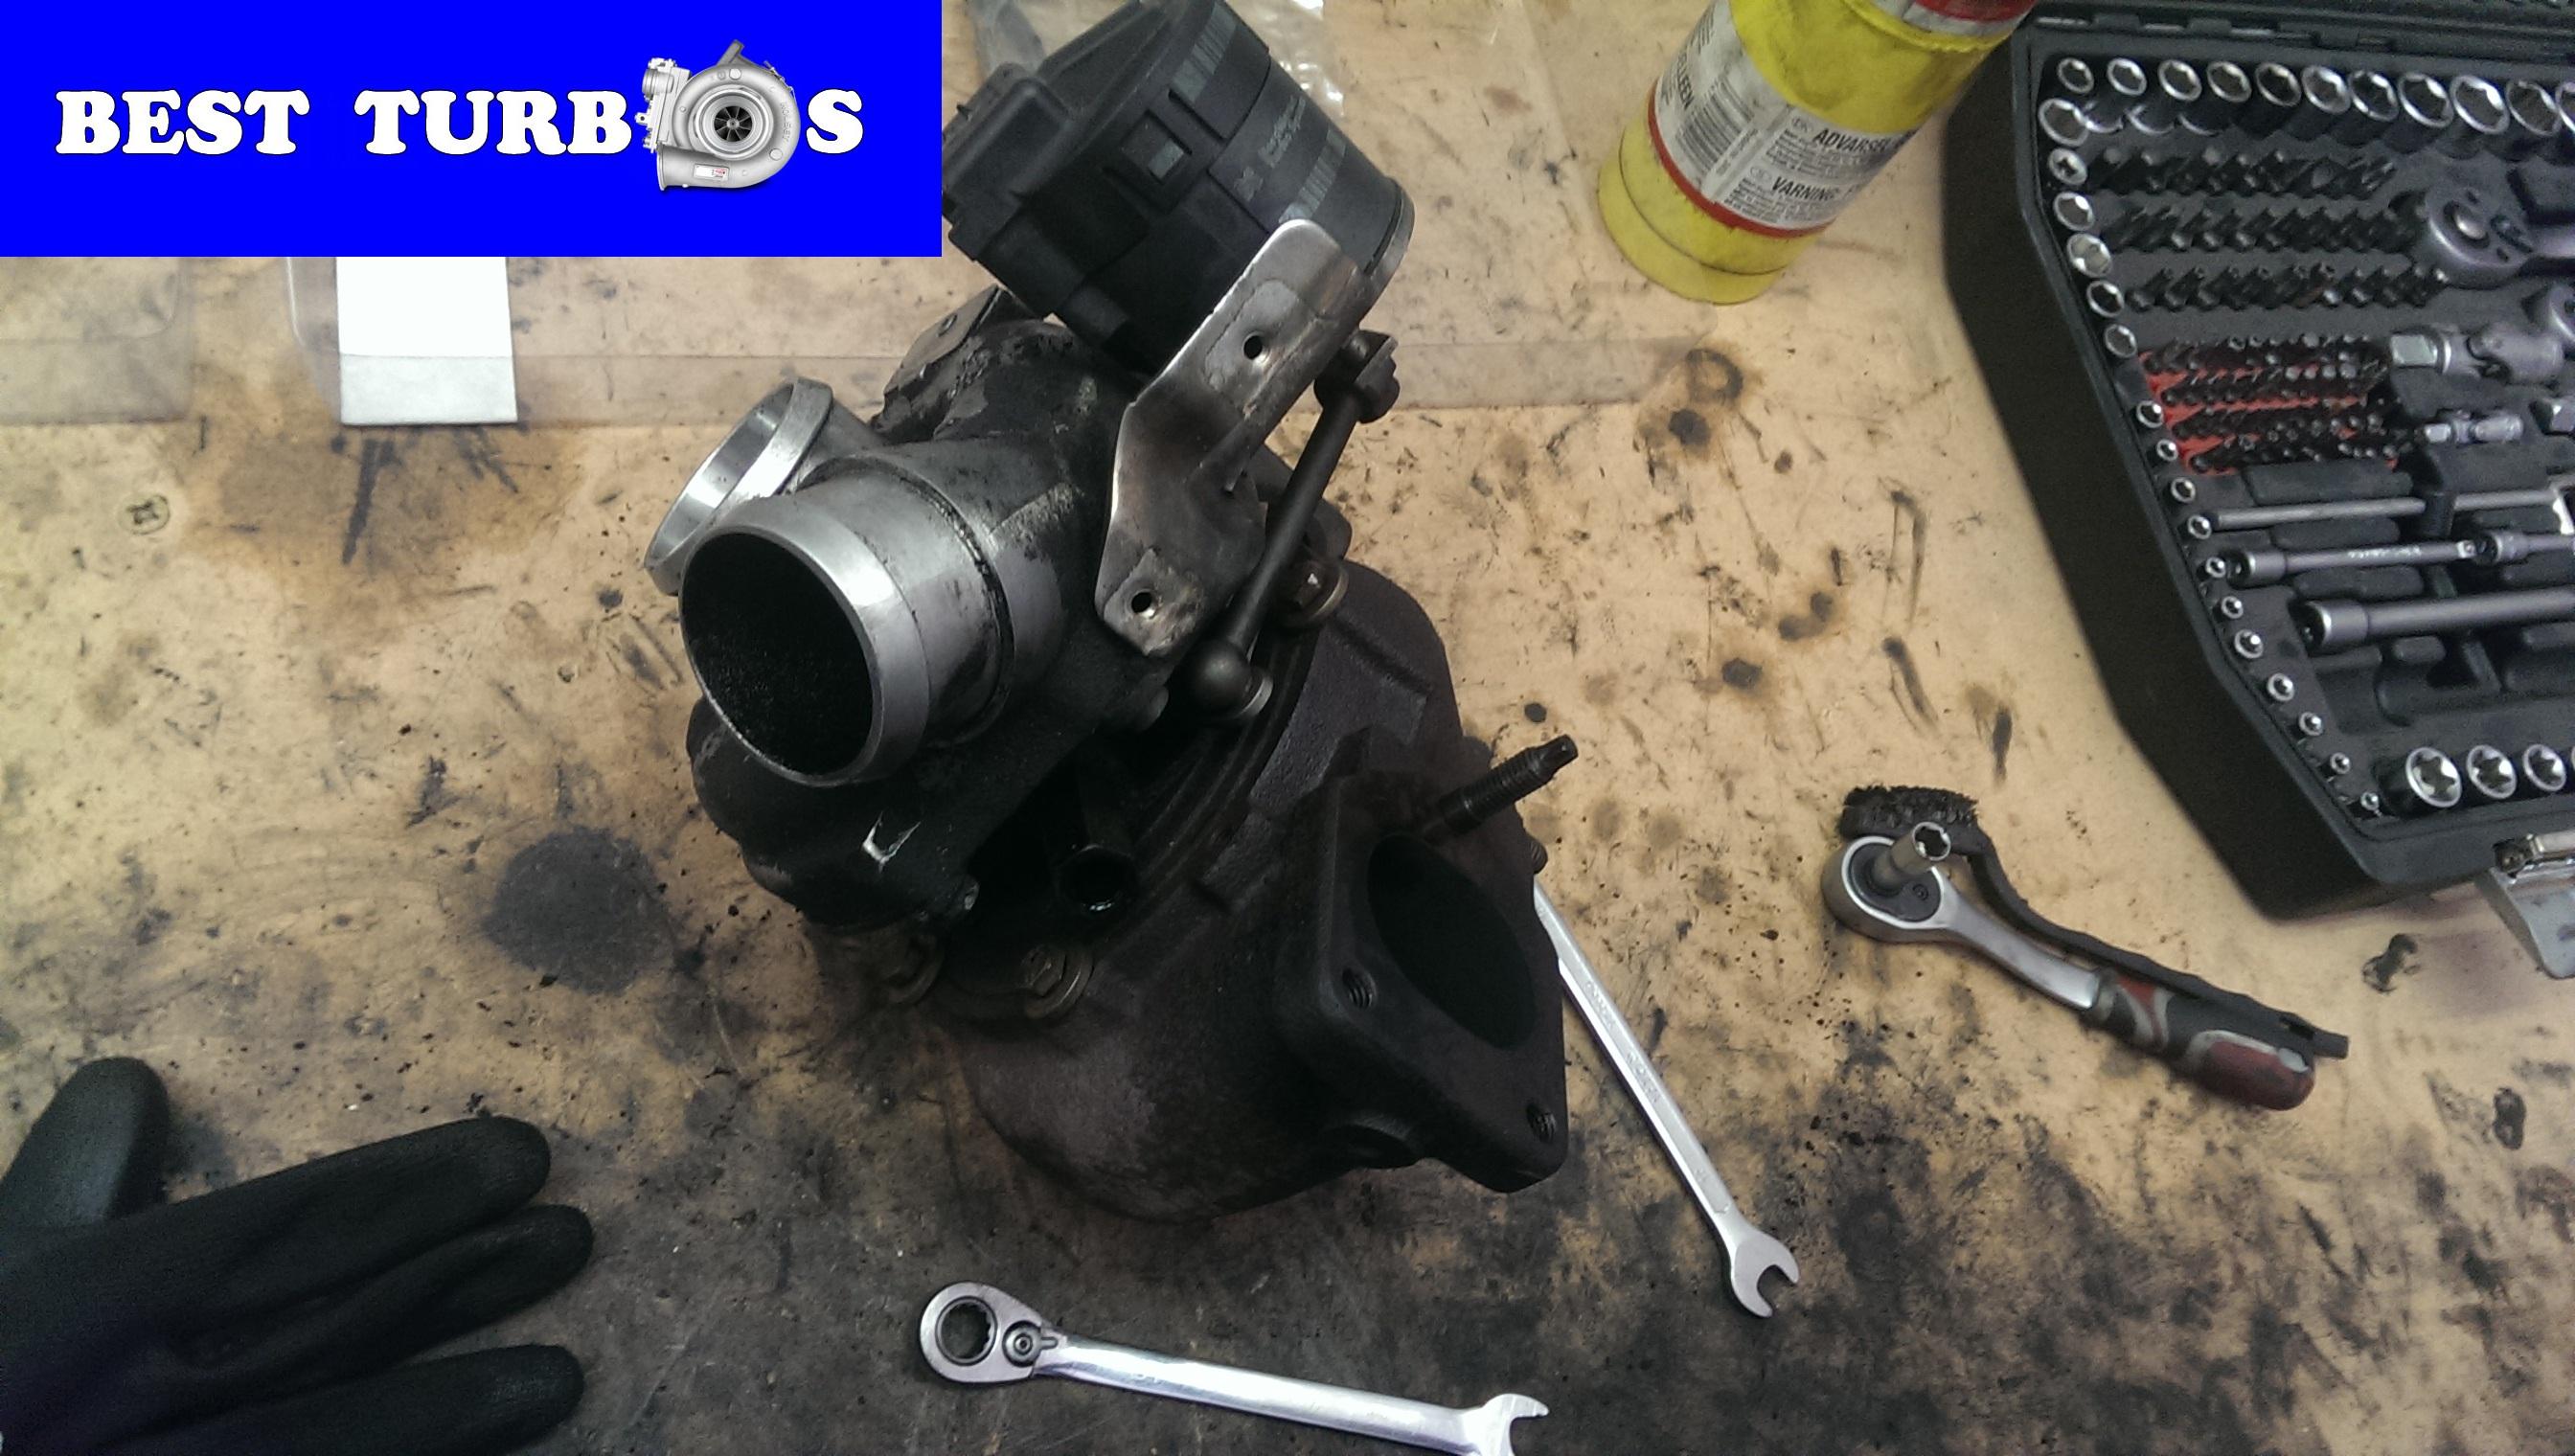 range rover sport  2.7 diesel reconditioning birmingham oldbury land rover repair rebuild west midlands walsall wolverhampton